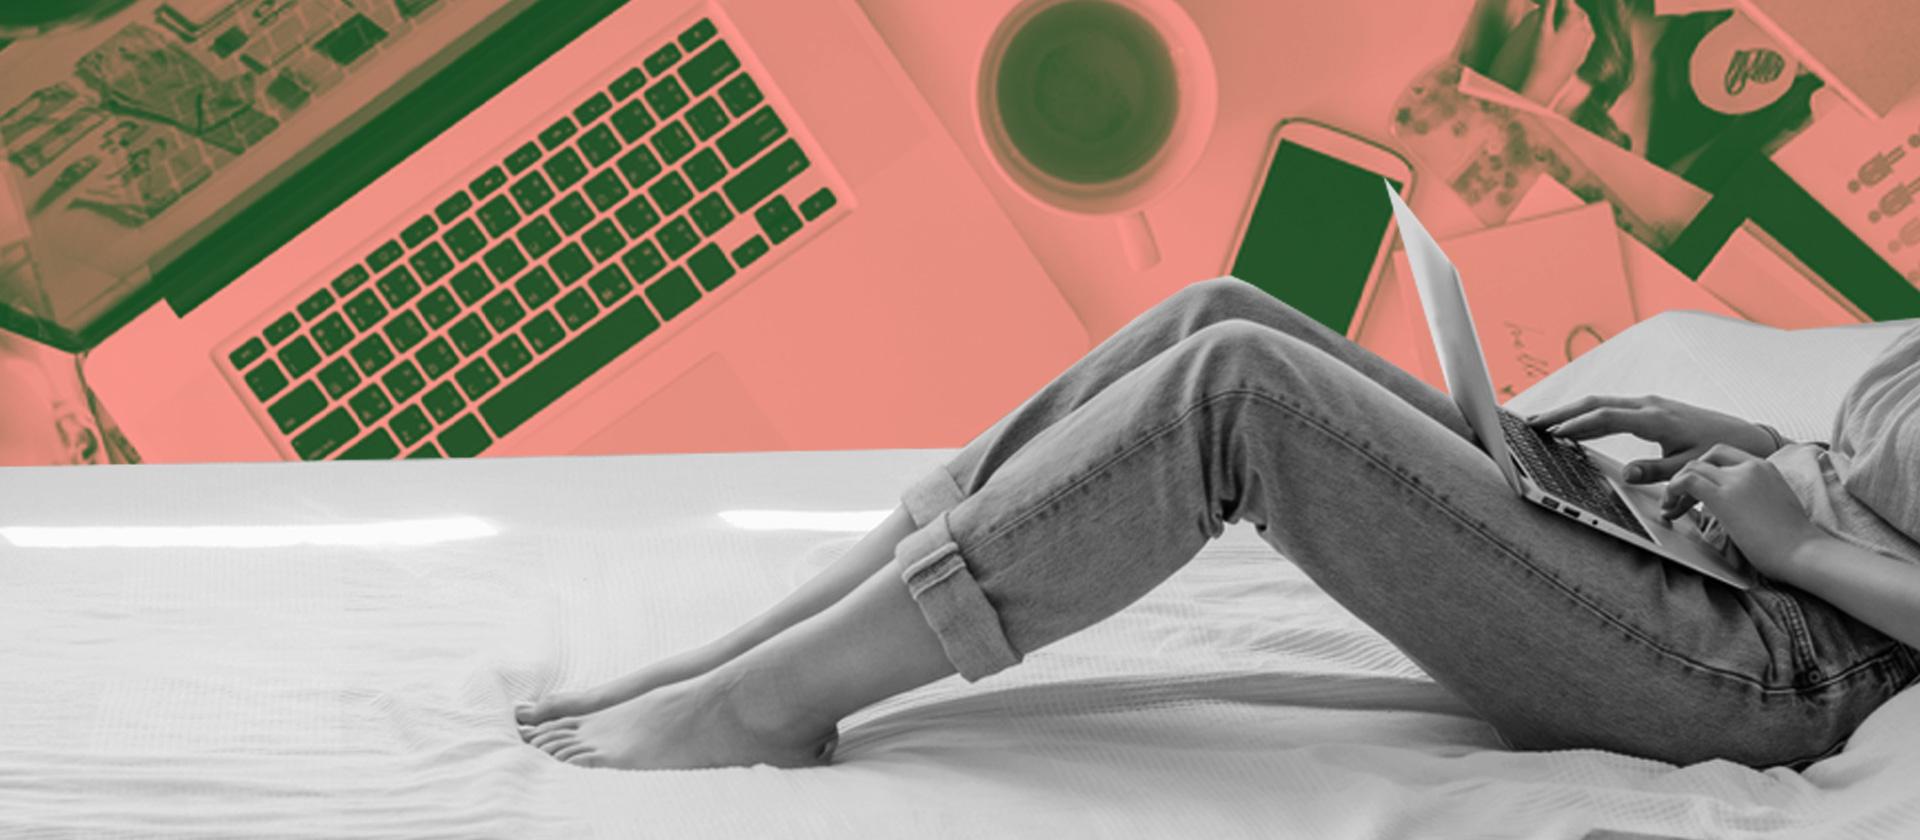 6 Common Career Mistakes Freelancers Make